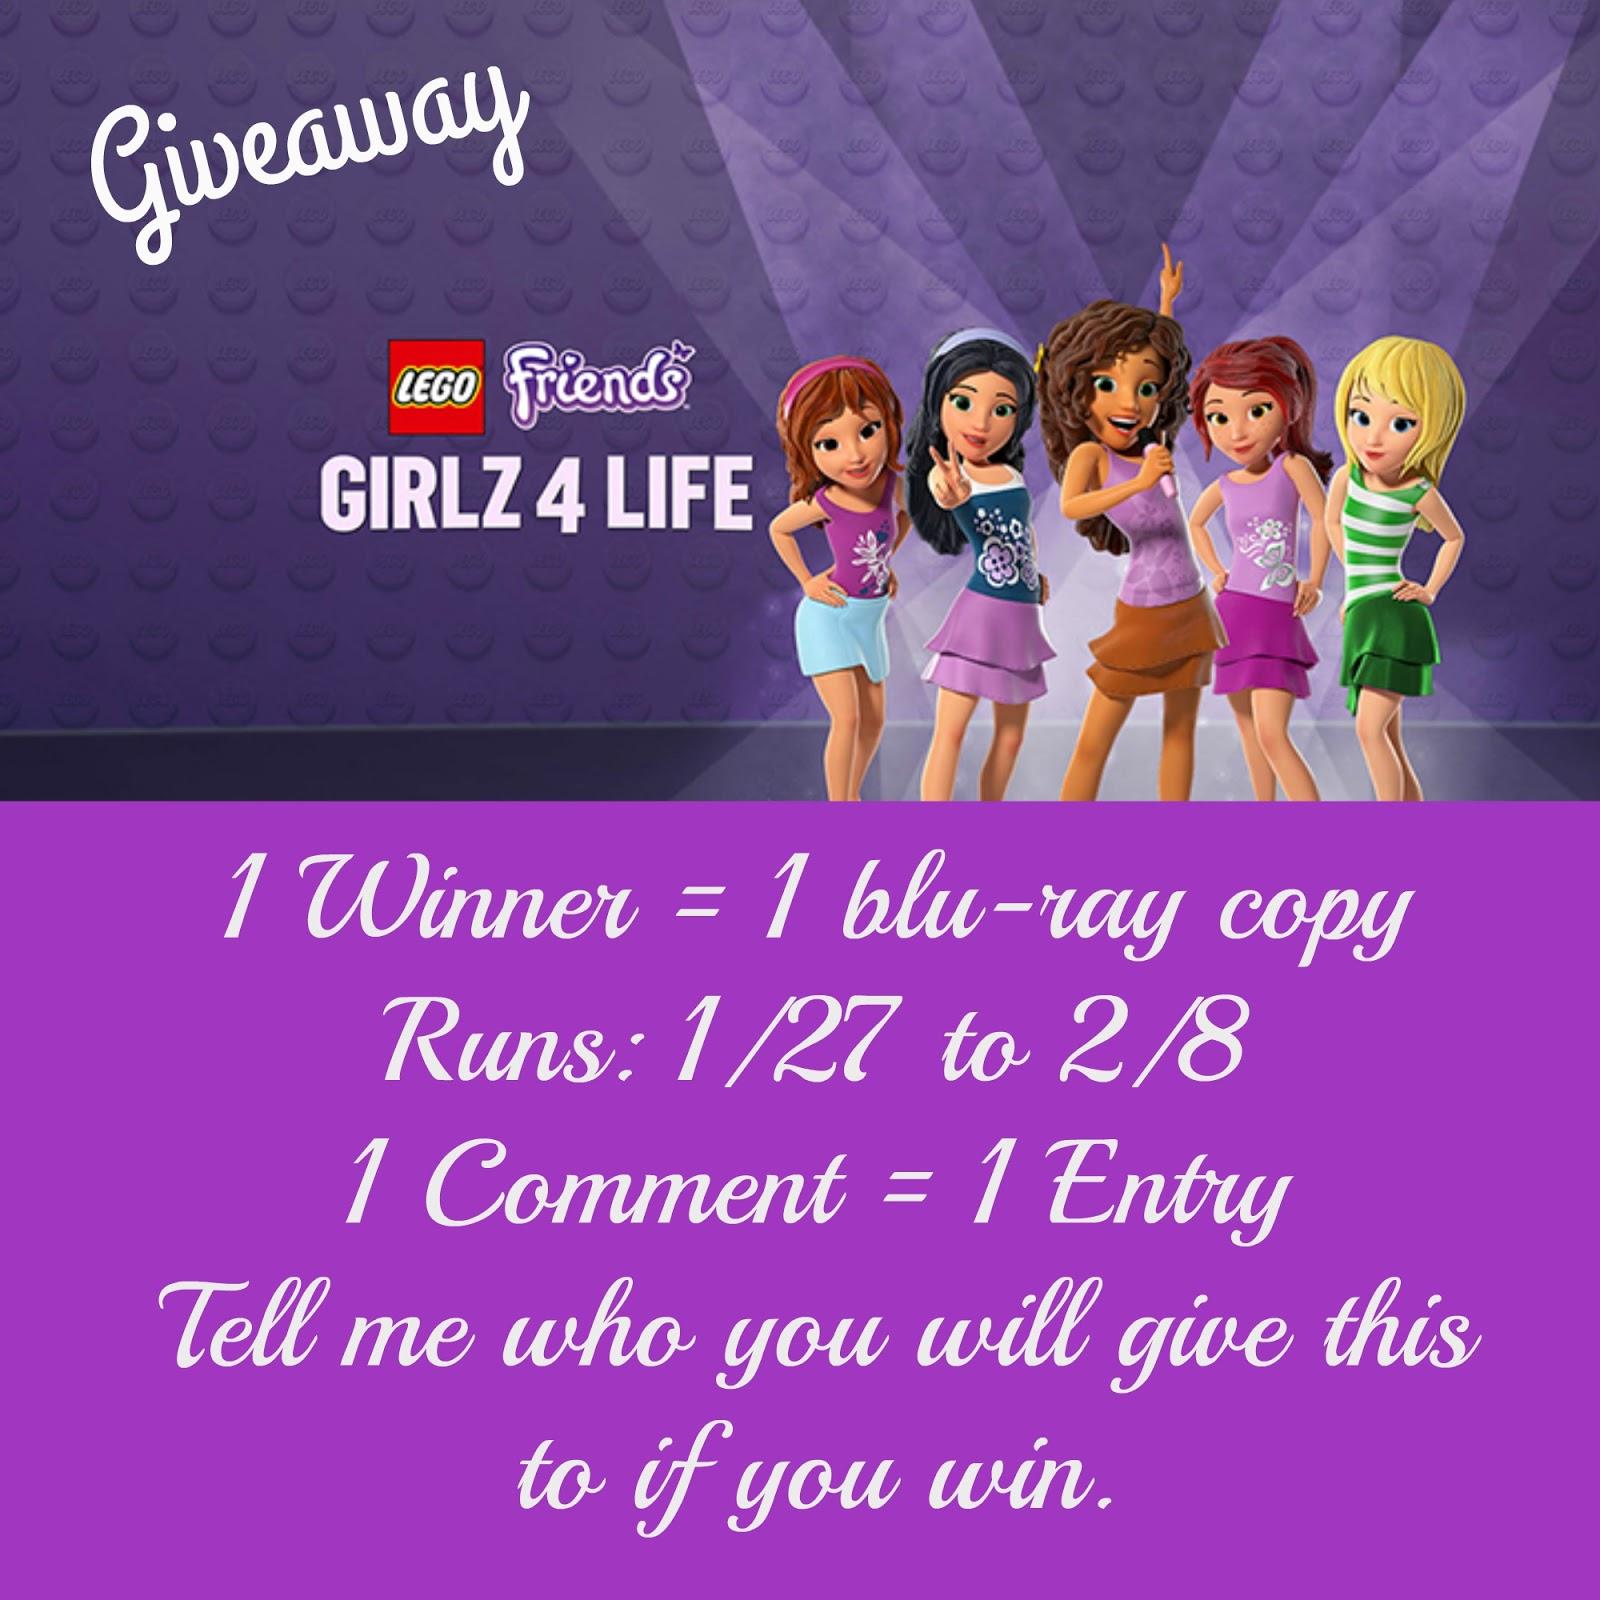 Debras Random Rambles Lego Friends Girlz 4 Life Giveaway